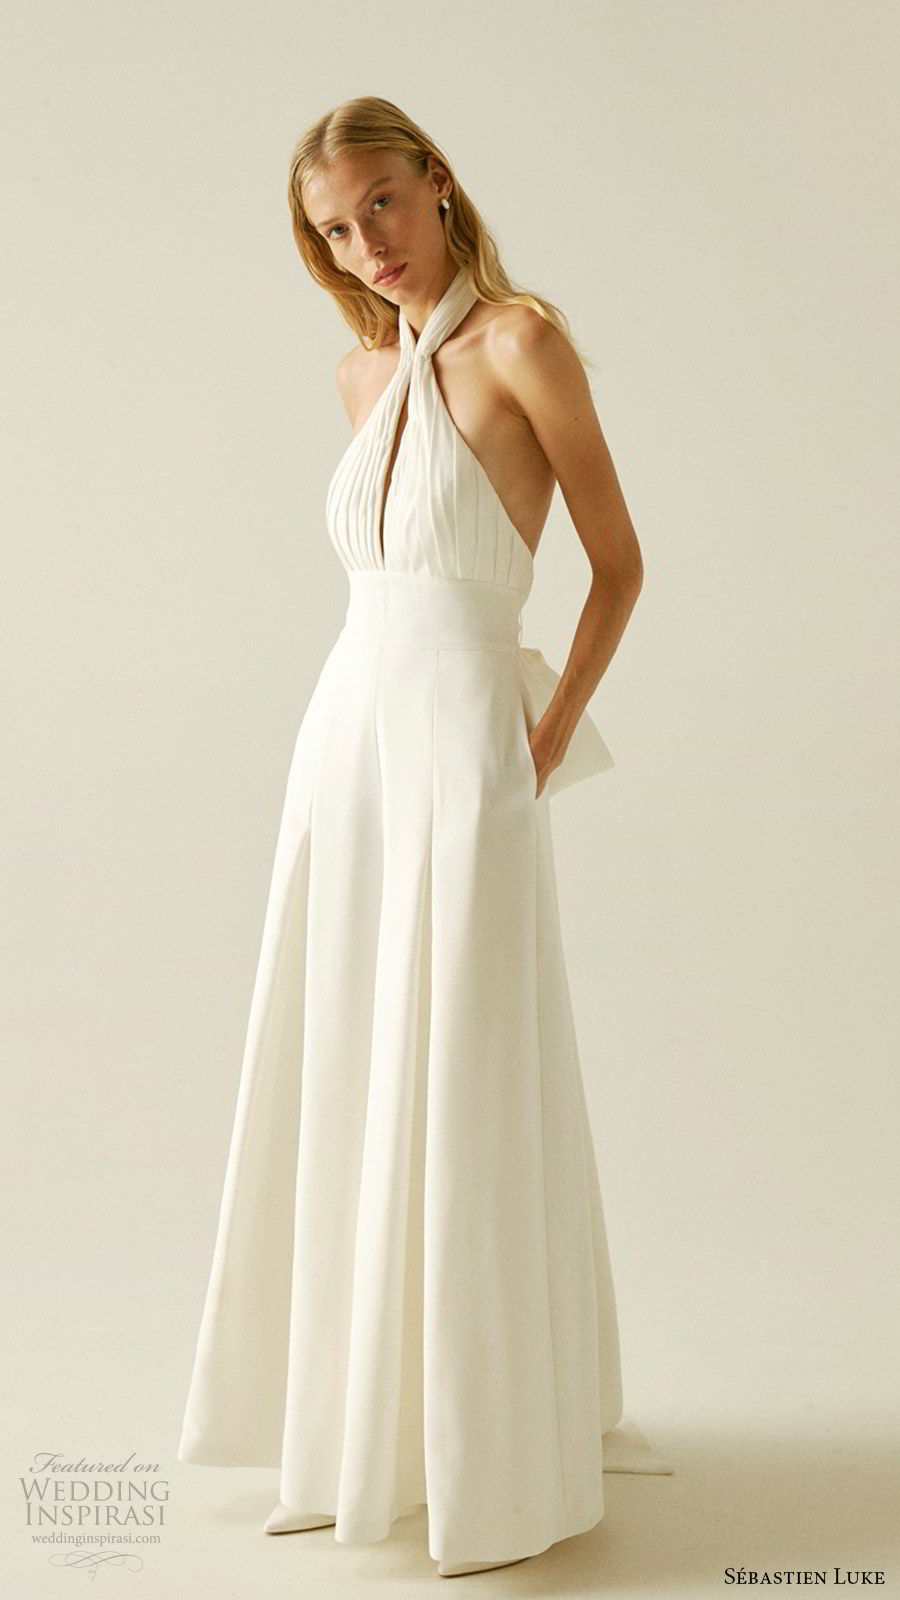 sebastien luke fall 2019 bridal sleeveless halter neckline keyhole ruched bodice pant suit wedding dress pockets (6)  mv